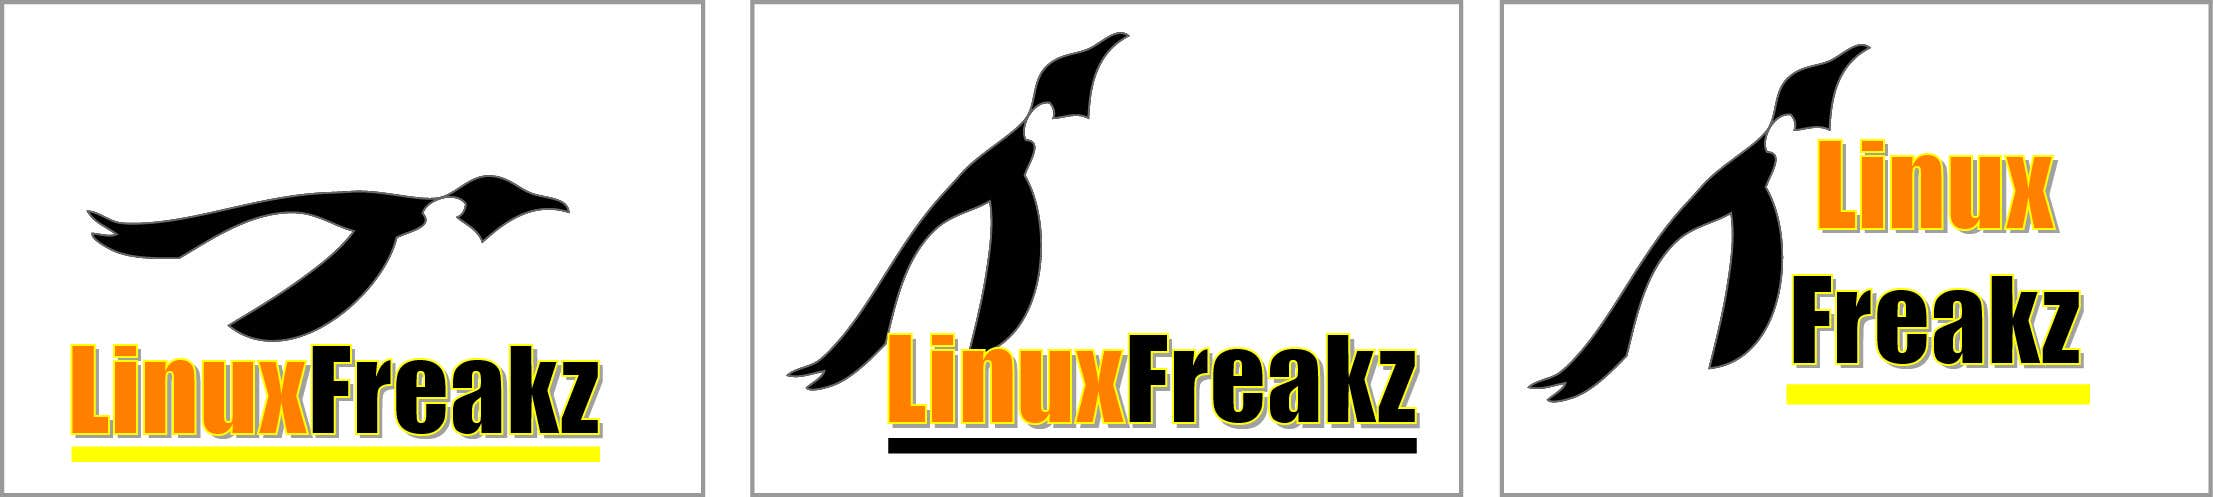 Penyertaan Peraduan #                                        29                                      untuk                                         Design a Logo for LinuxFreakz